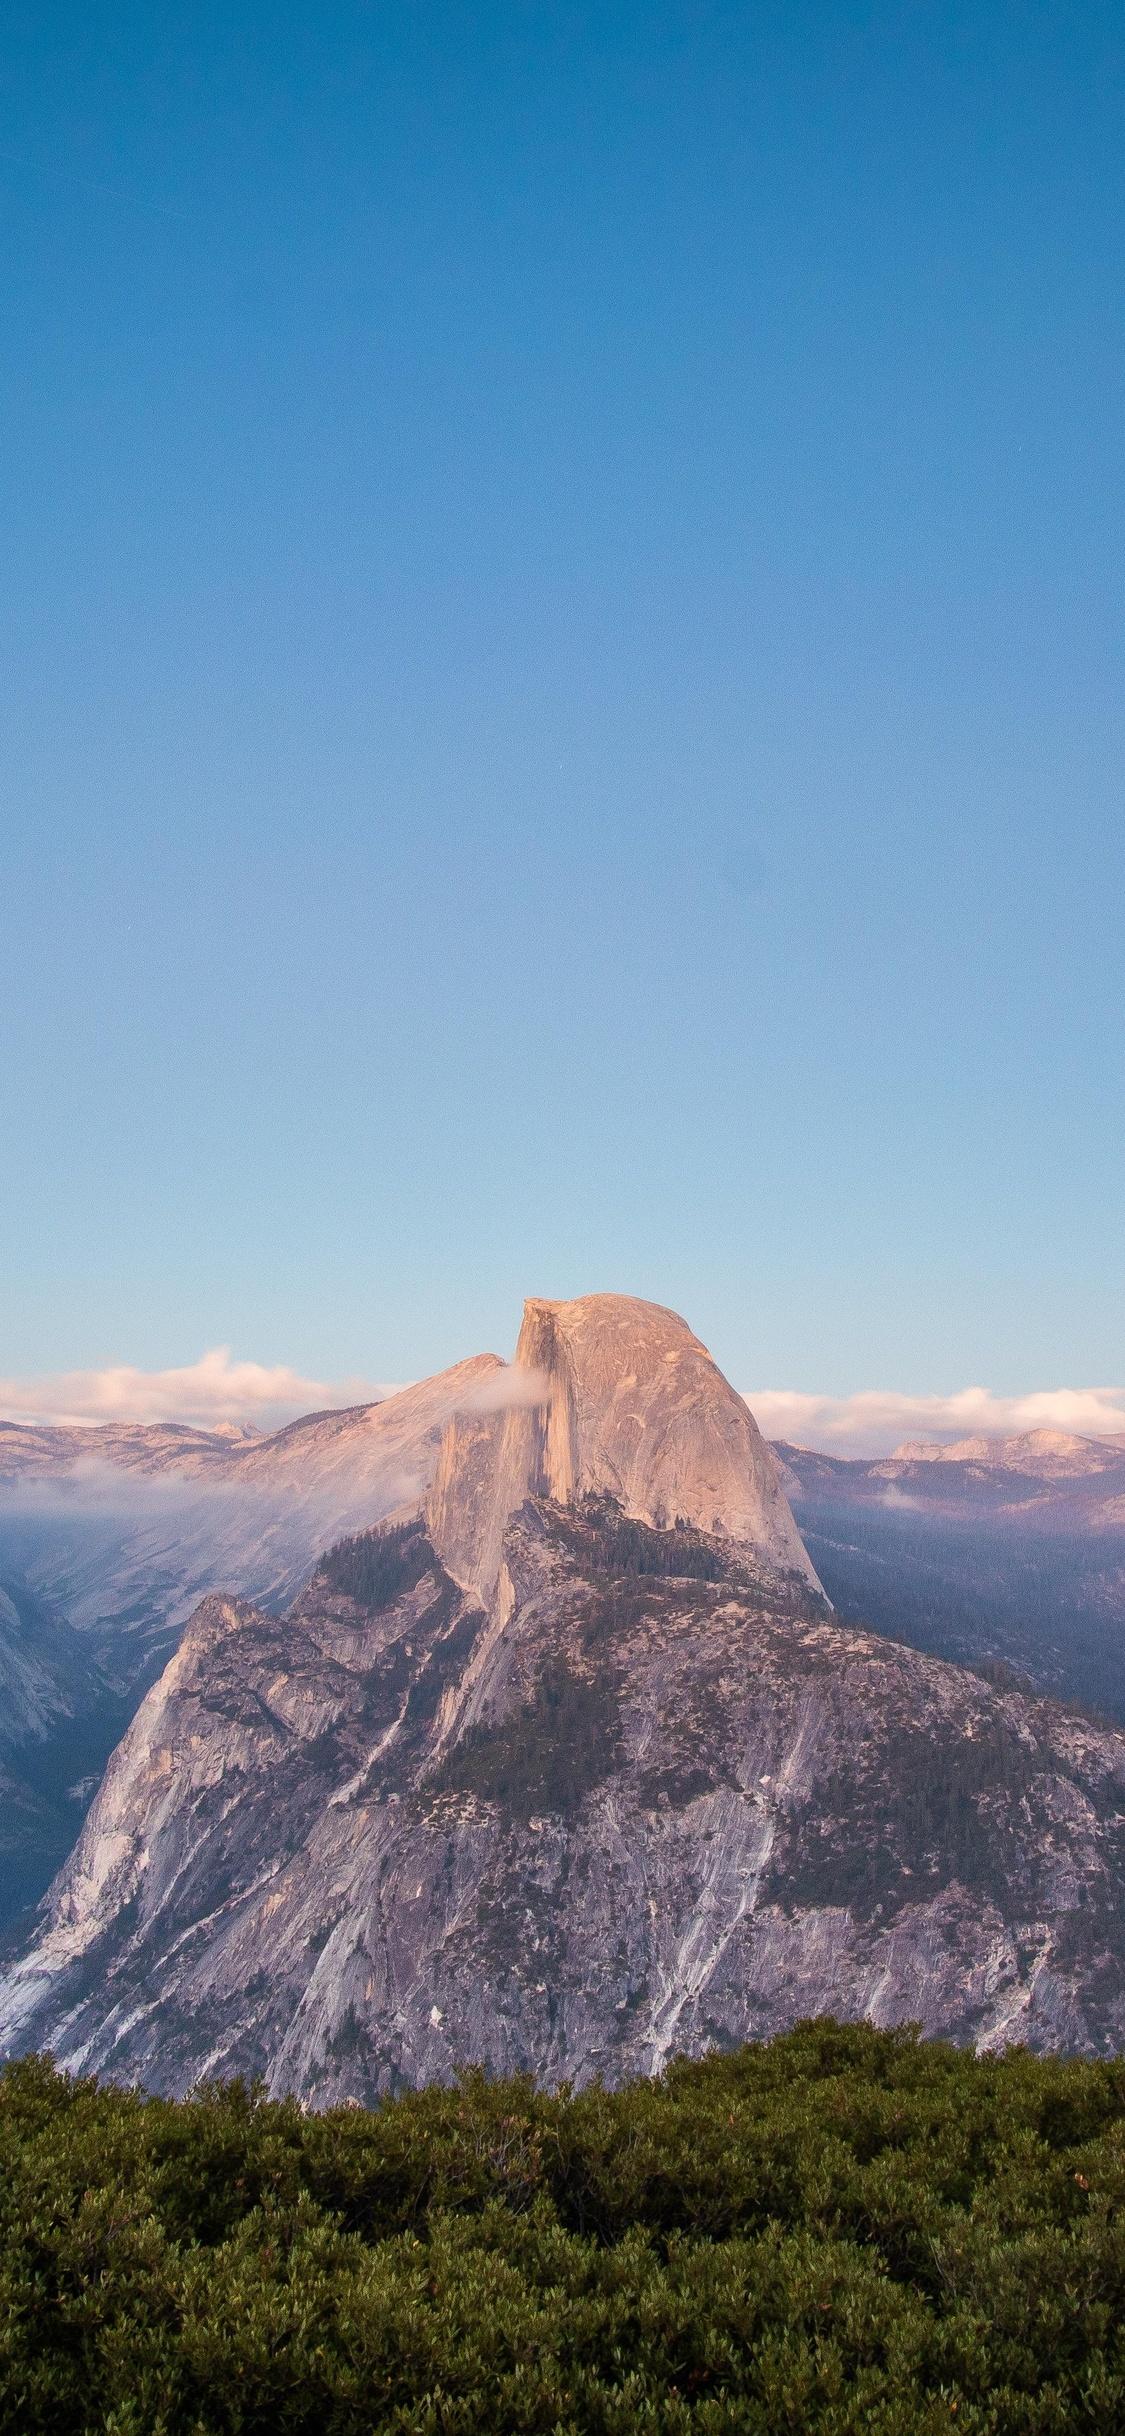 1125x2436 Glacier Point Yosemite 5k Iphone Xs Iphone 10